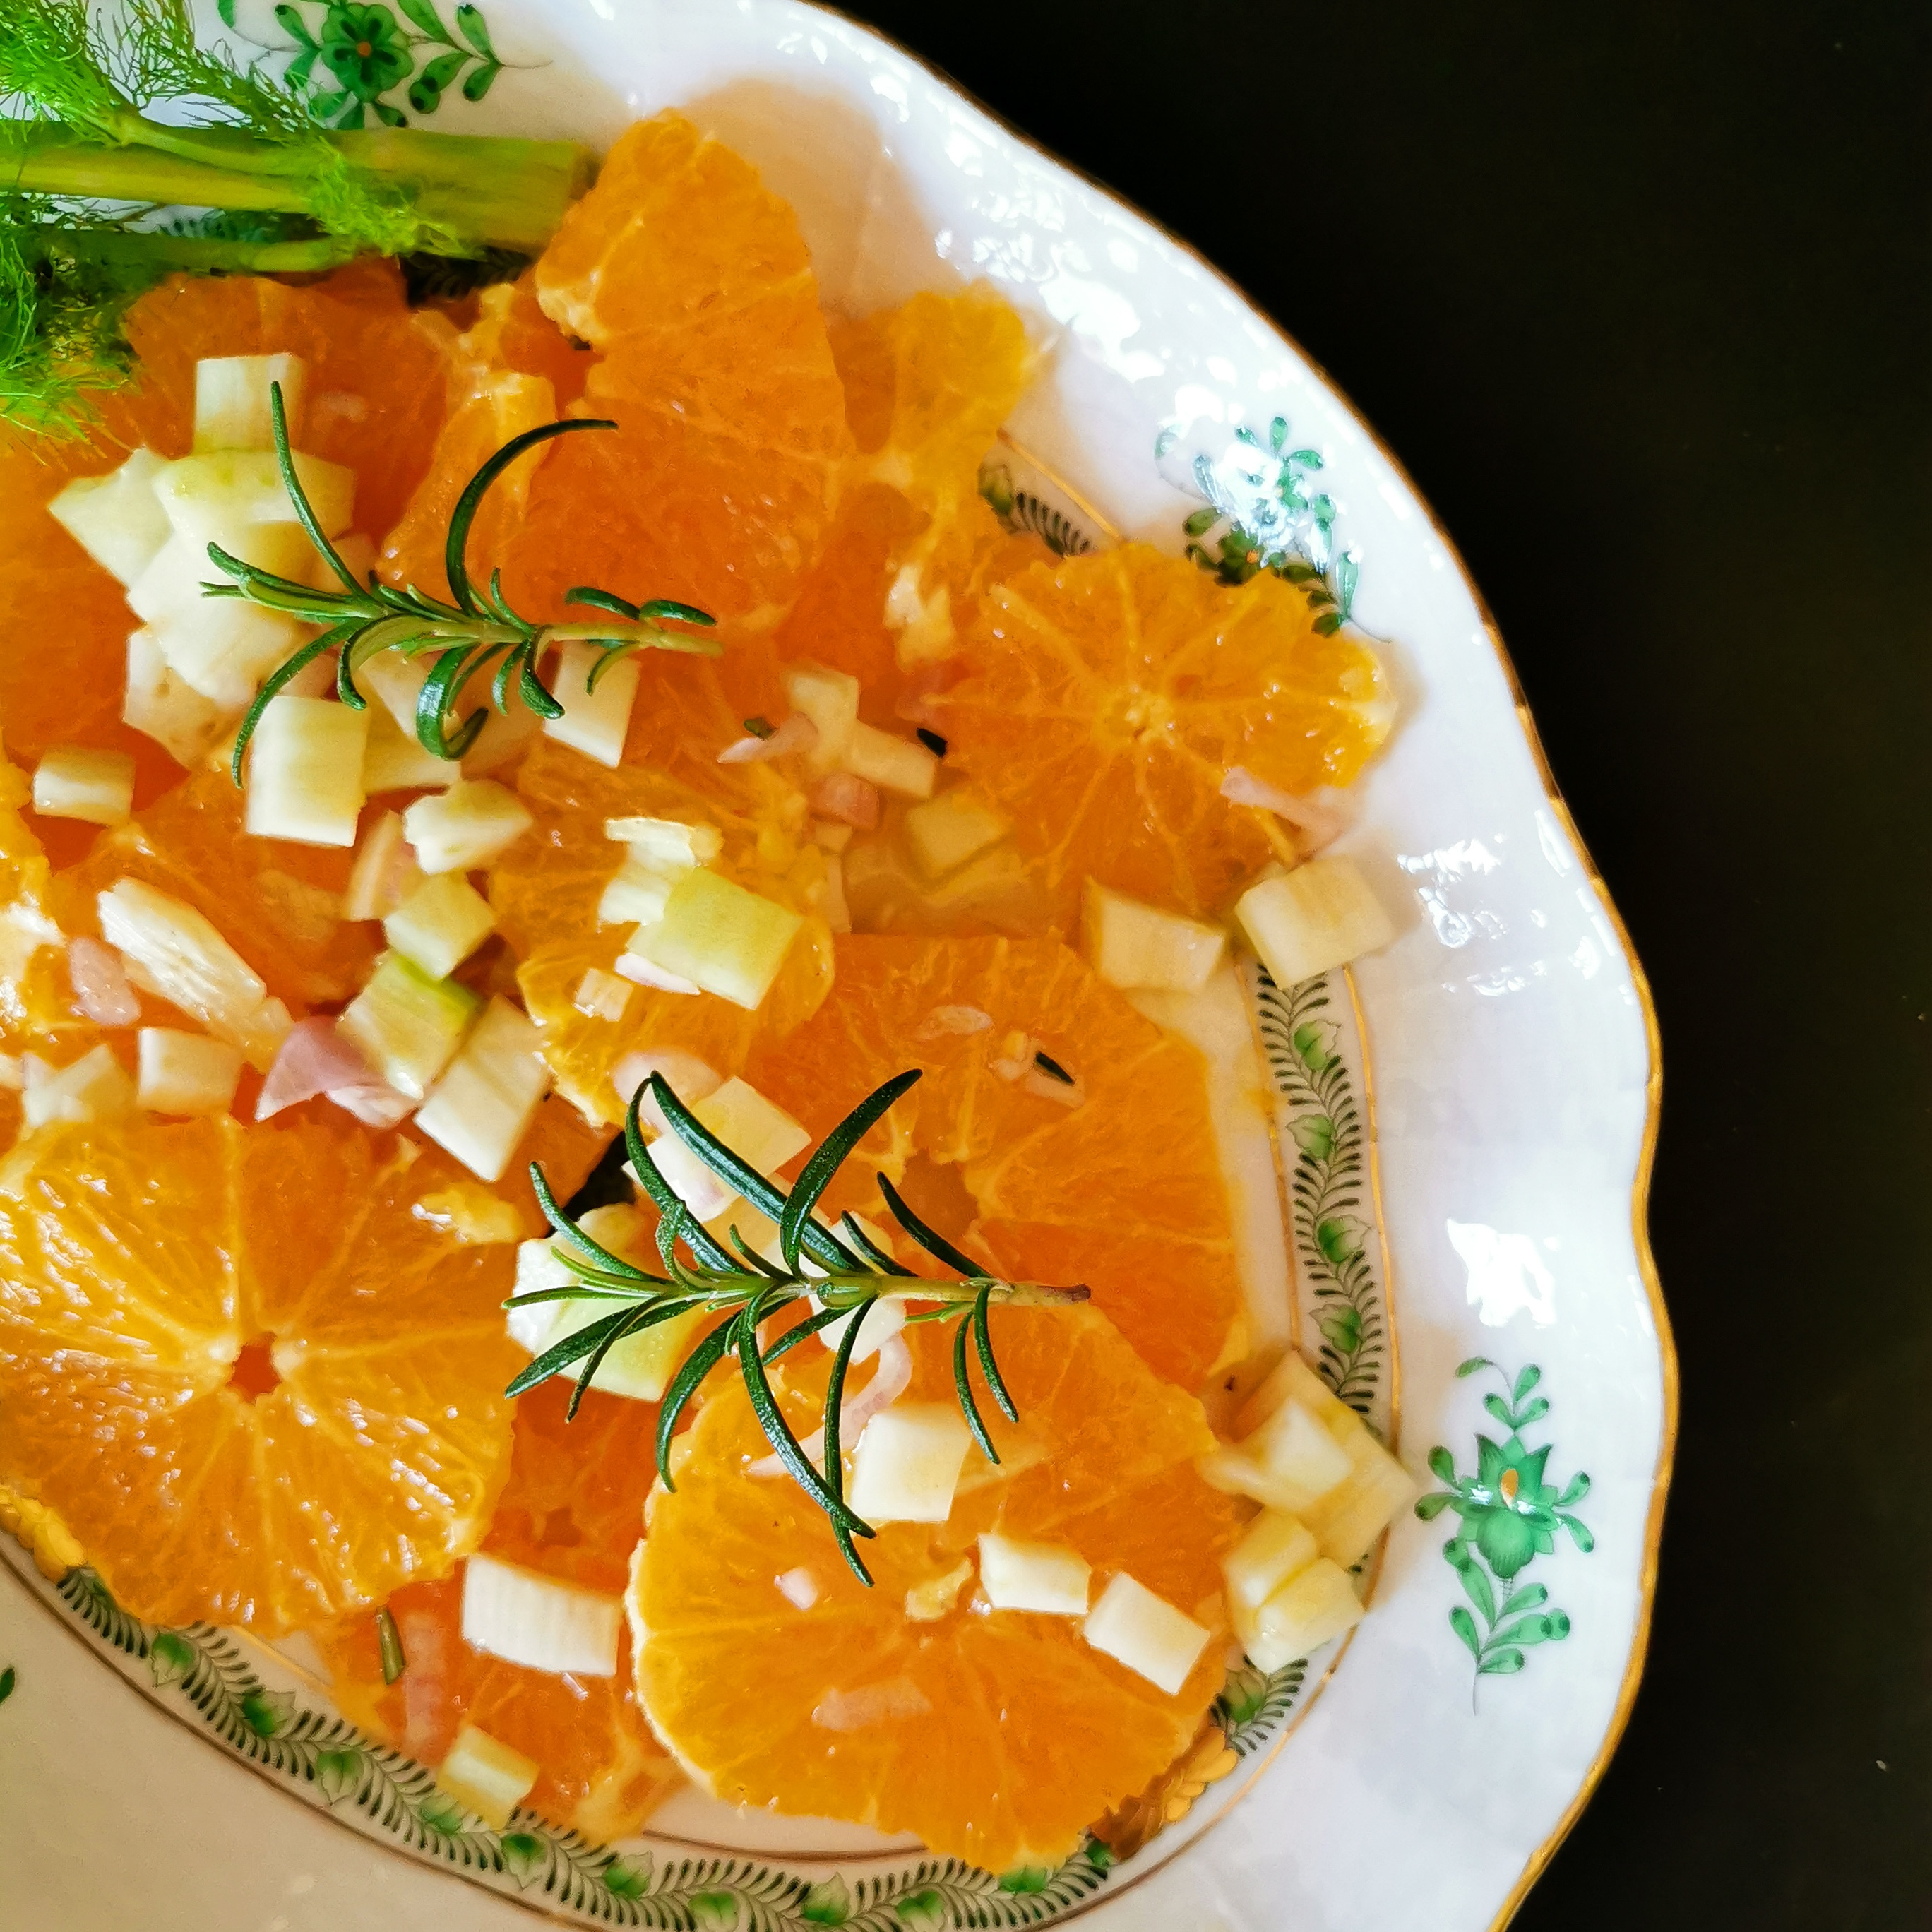 orangensalat.jpg